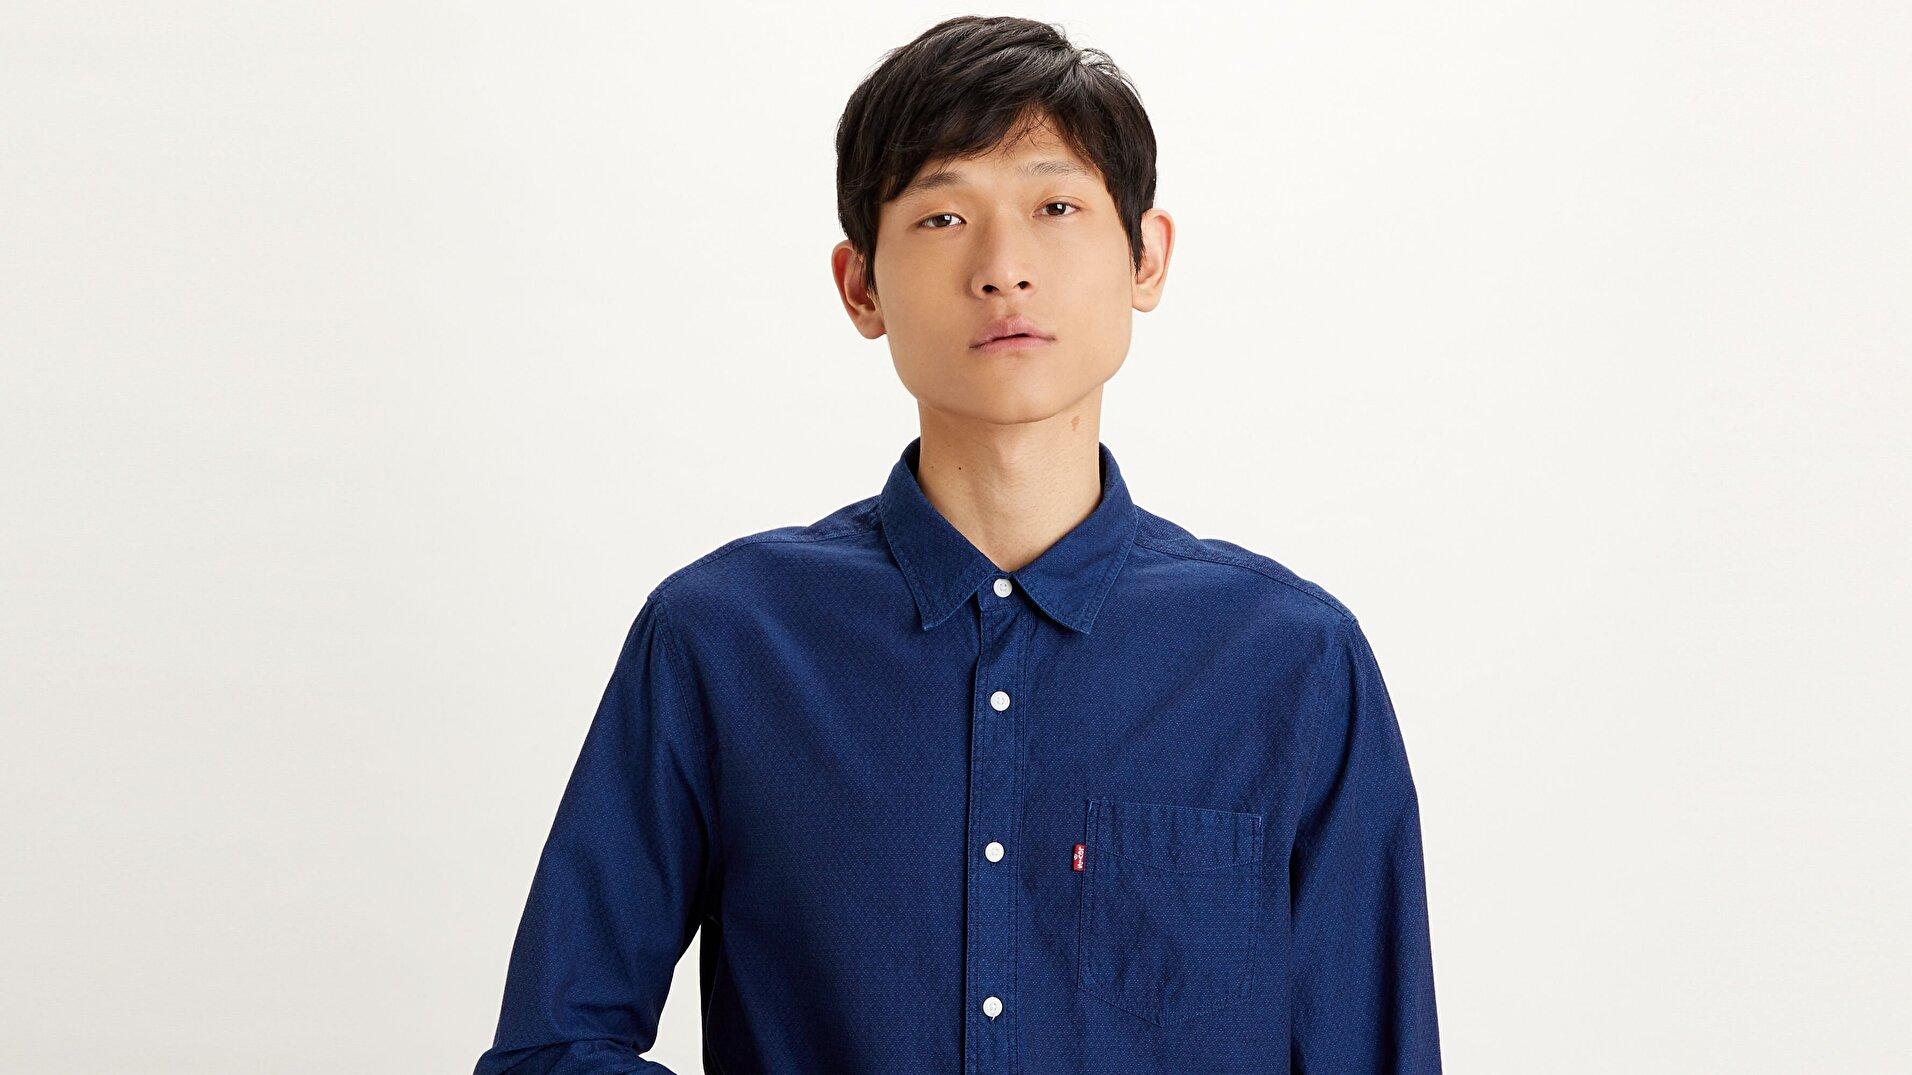 Sunset 1 Pocket Standard Erkek Denim Gömlek - İndigo Dobby